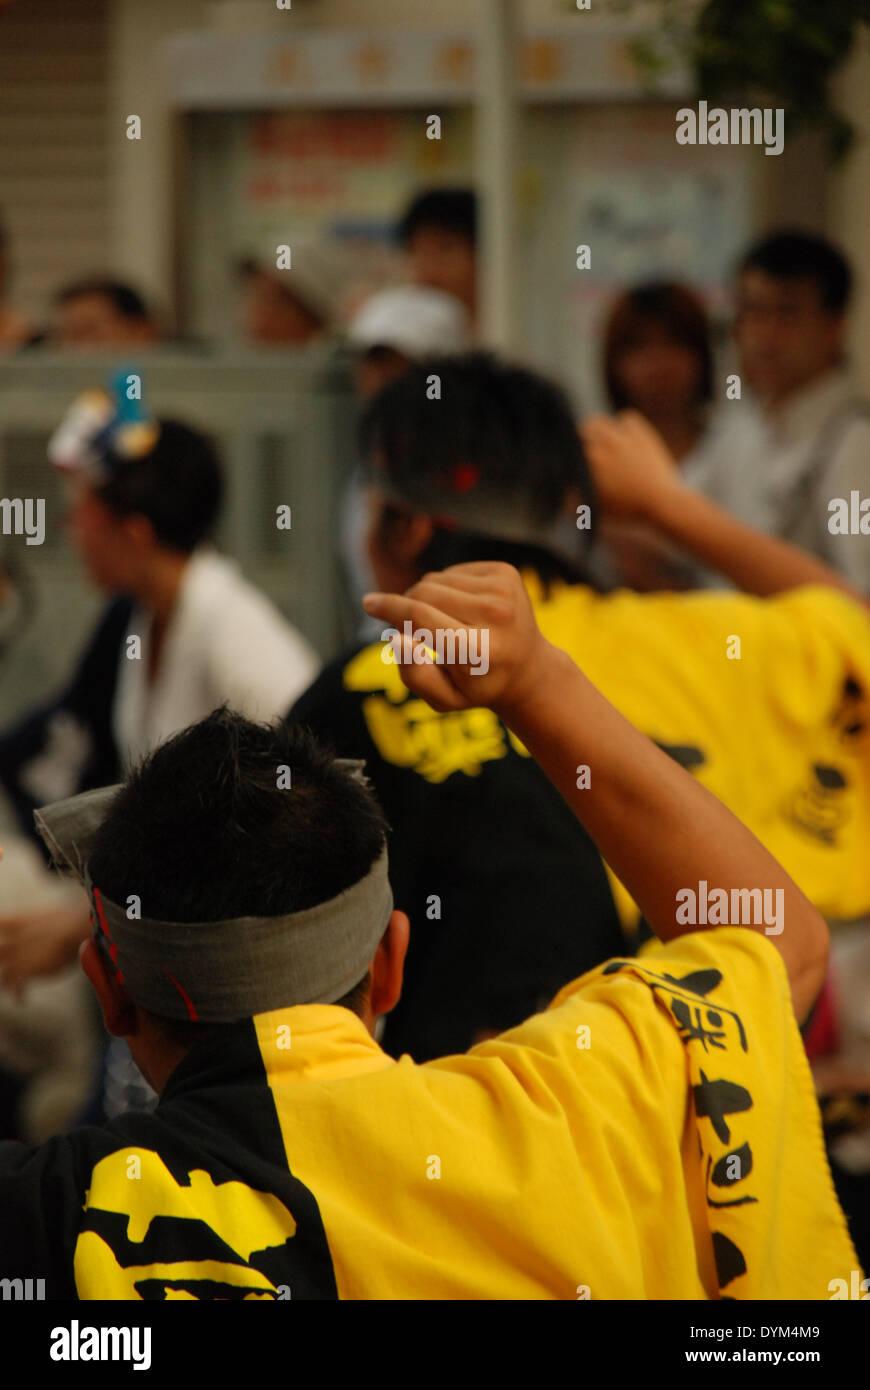 Dancers at Yamato matsuri festival, Kanagawa Prefecture, Japan - Stock Image